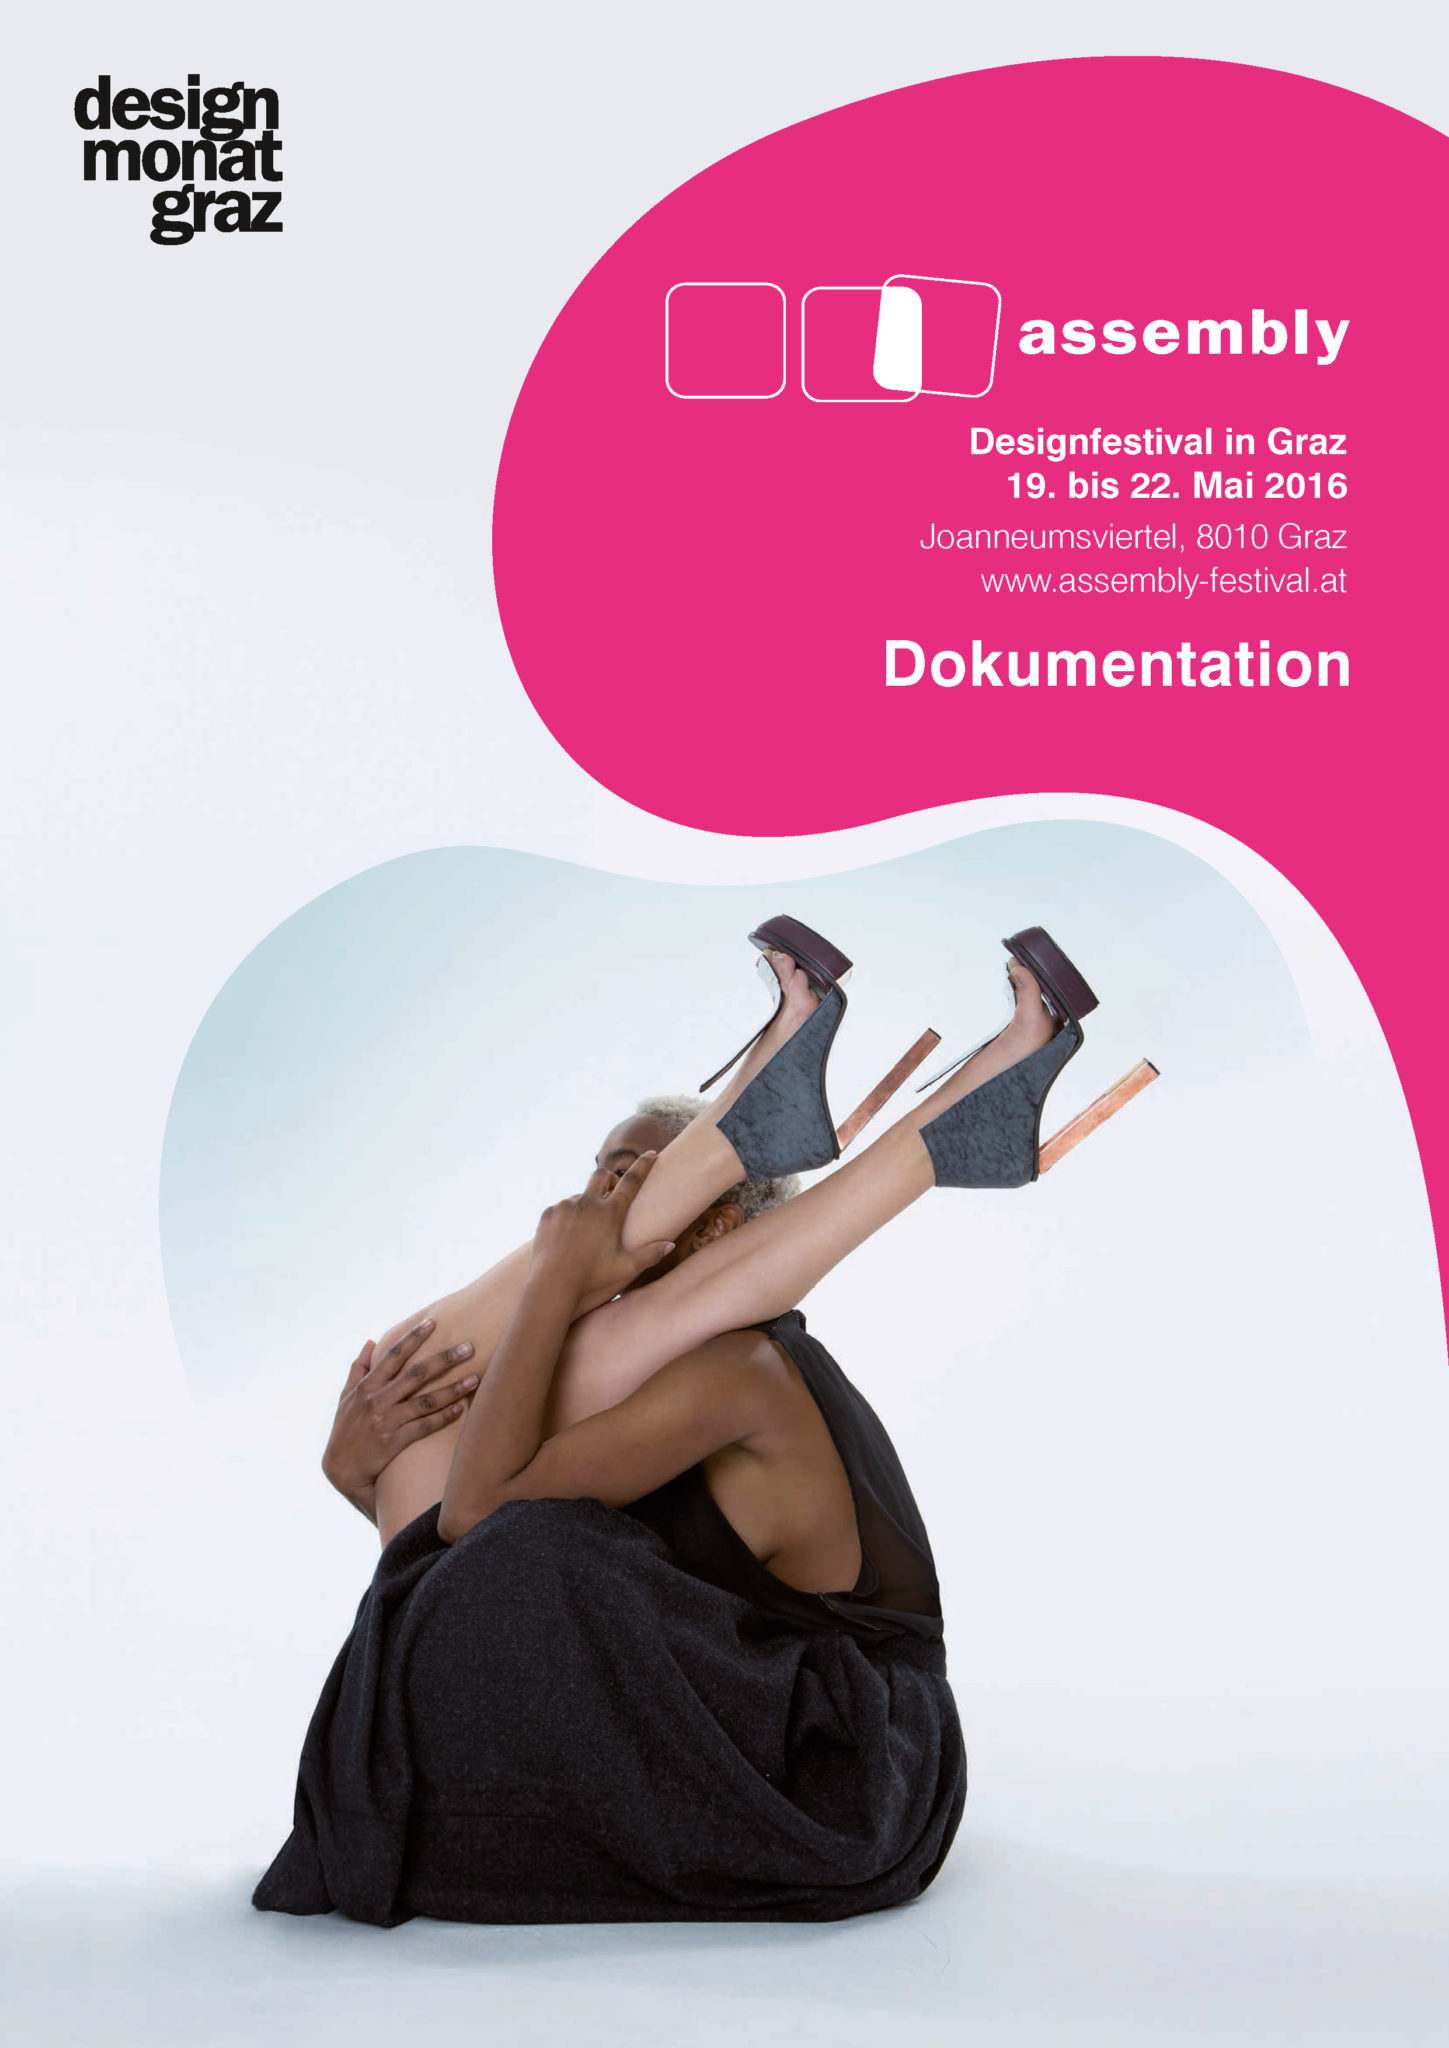 assembly Festival Archive 2016